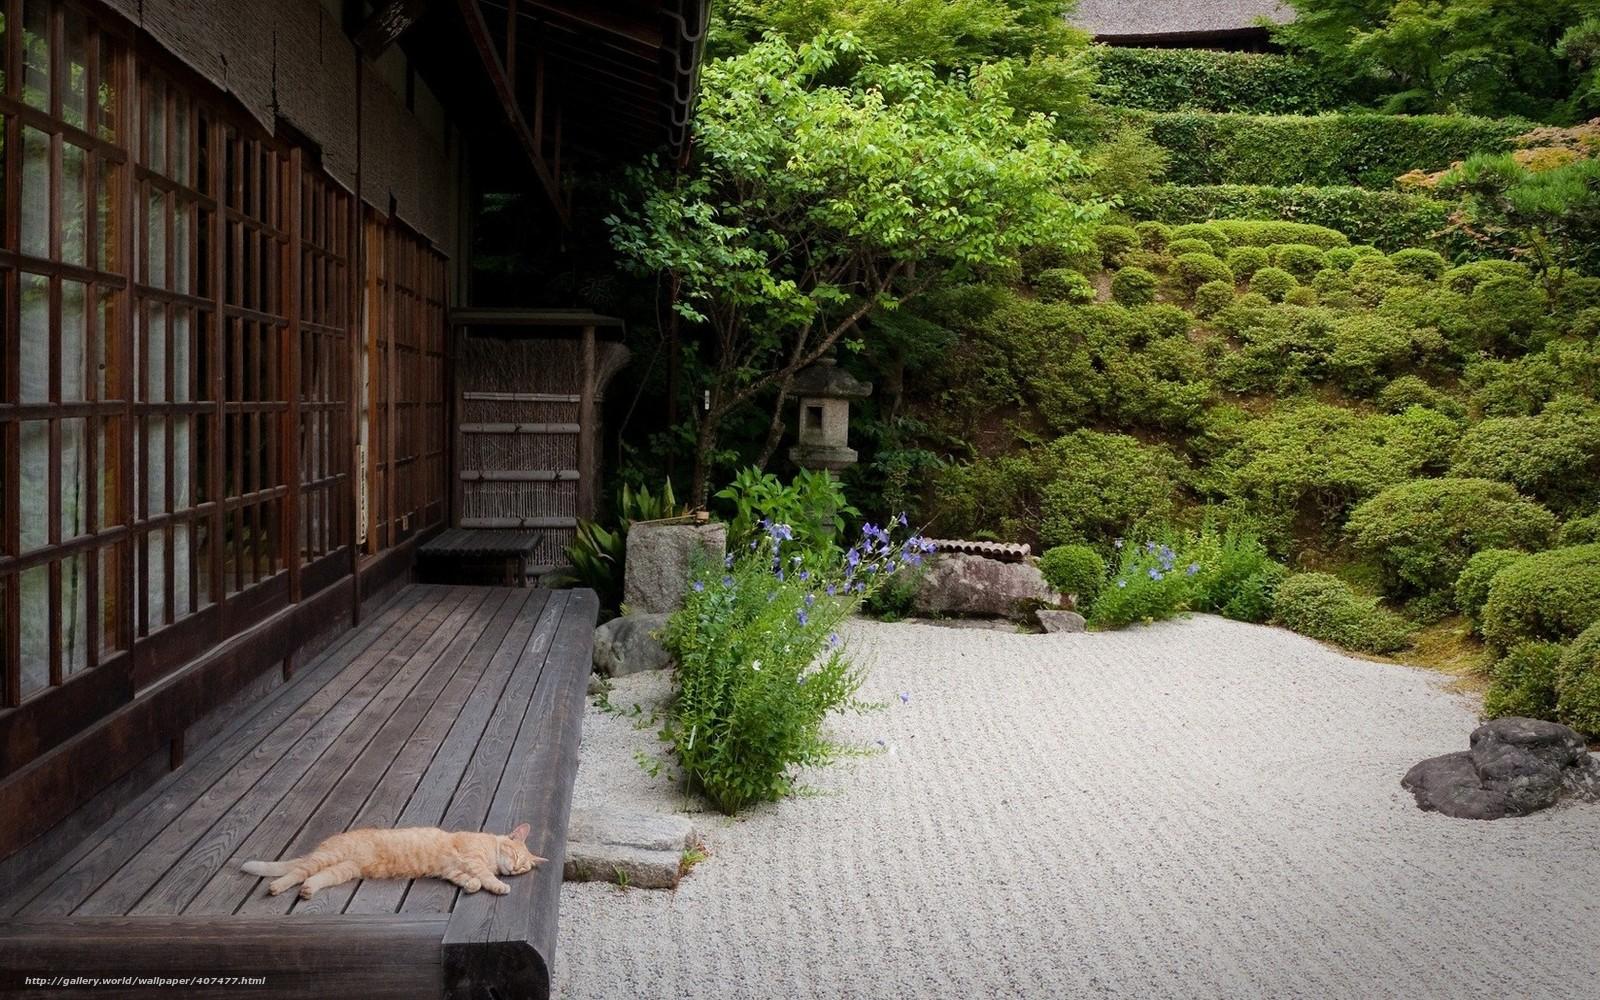 Tlcharger Fond decran Japon, maison, jardin, patio Fonds decran ...